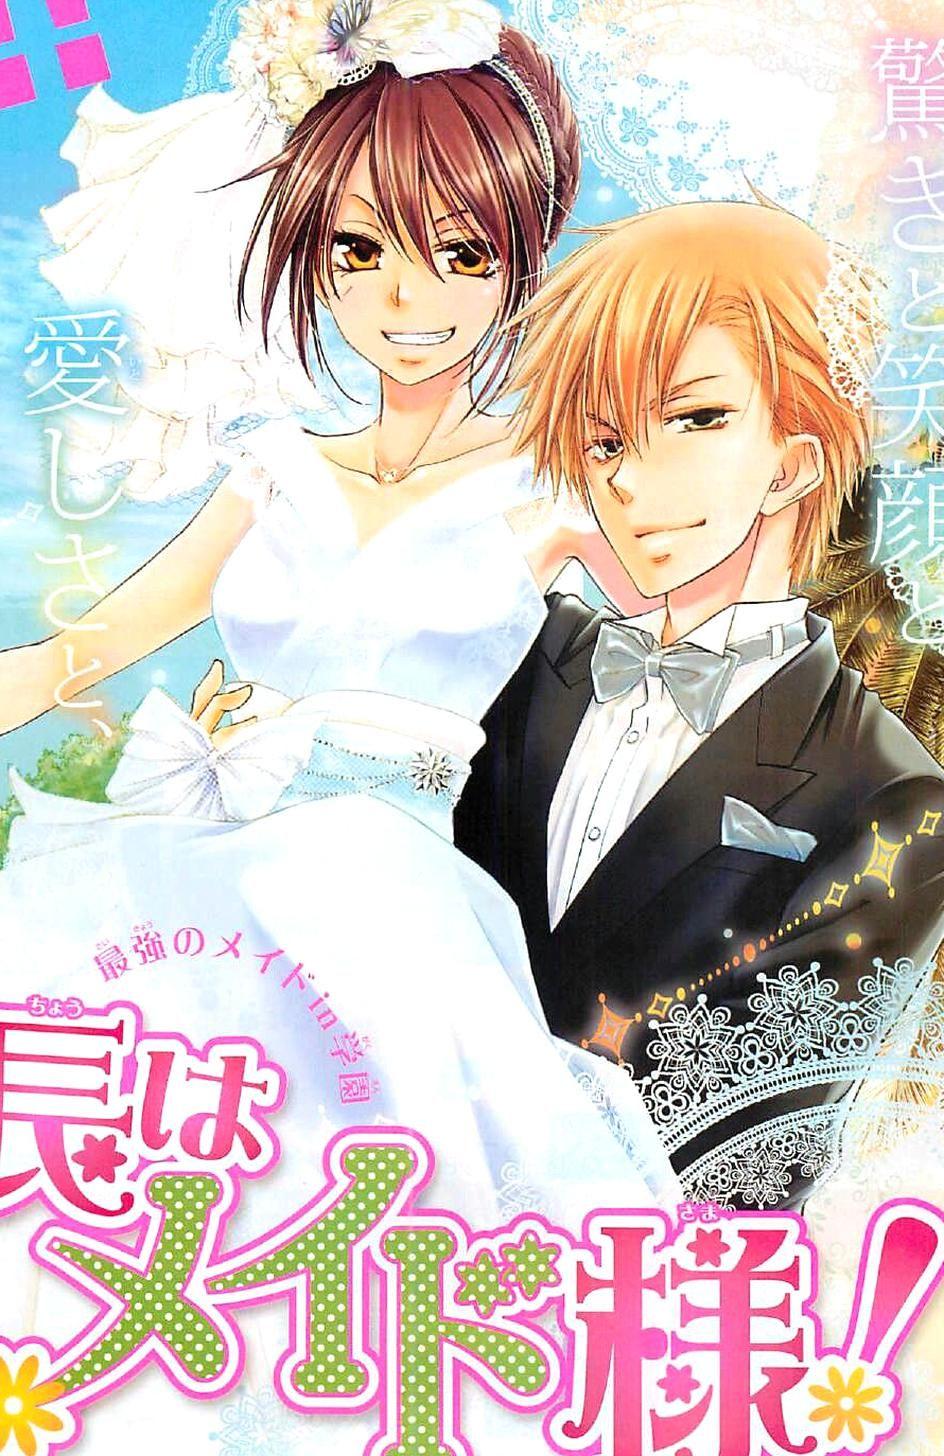 Good Anime in 2020 Maid sama, Kaichō wa maidsama!, Best